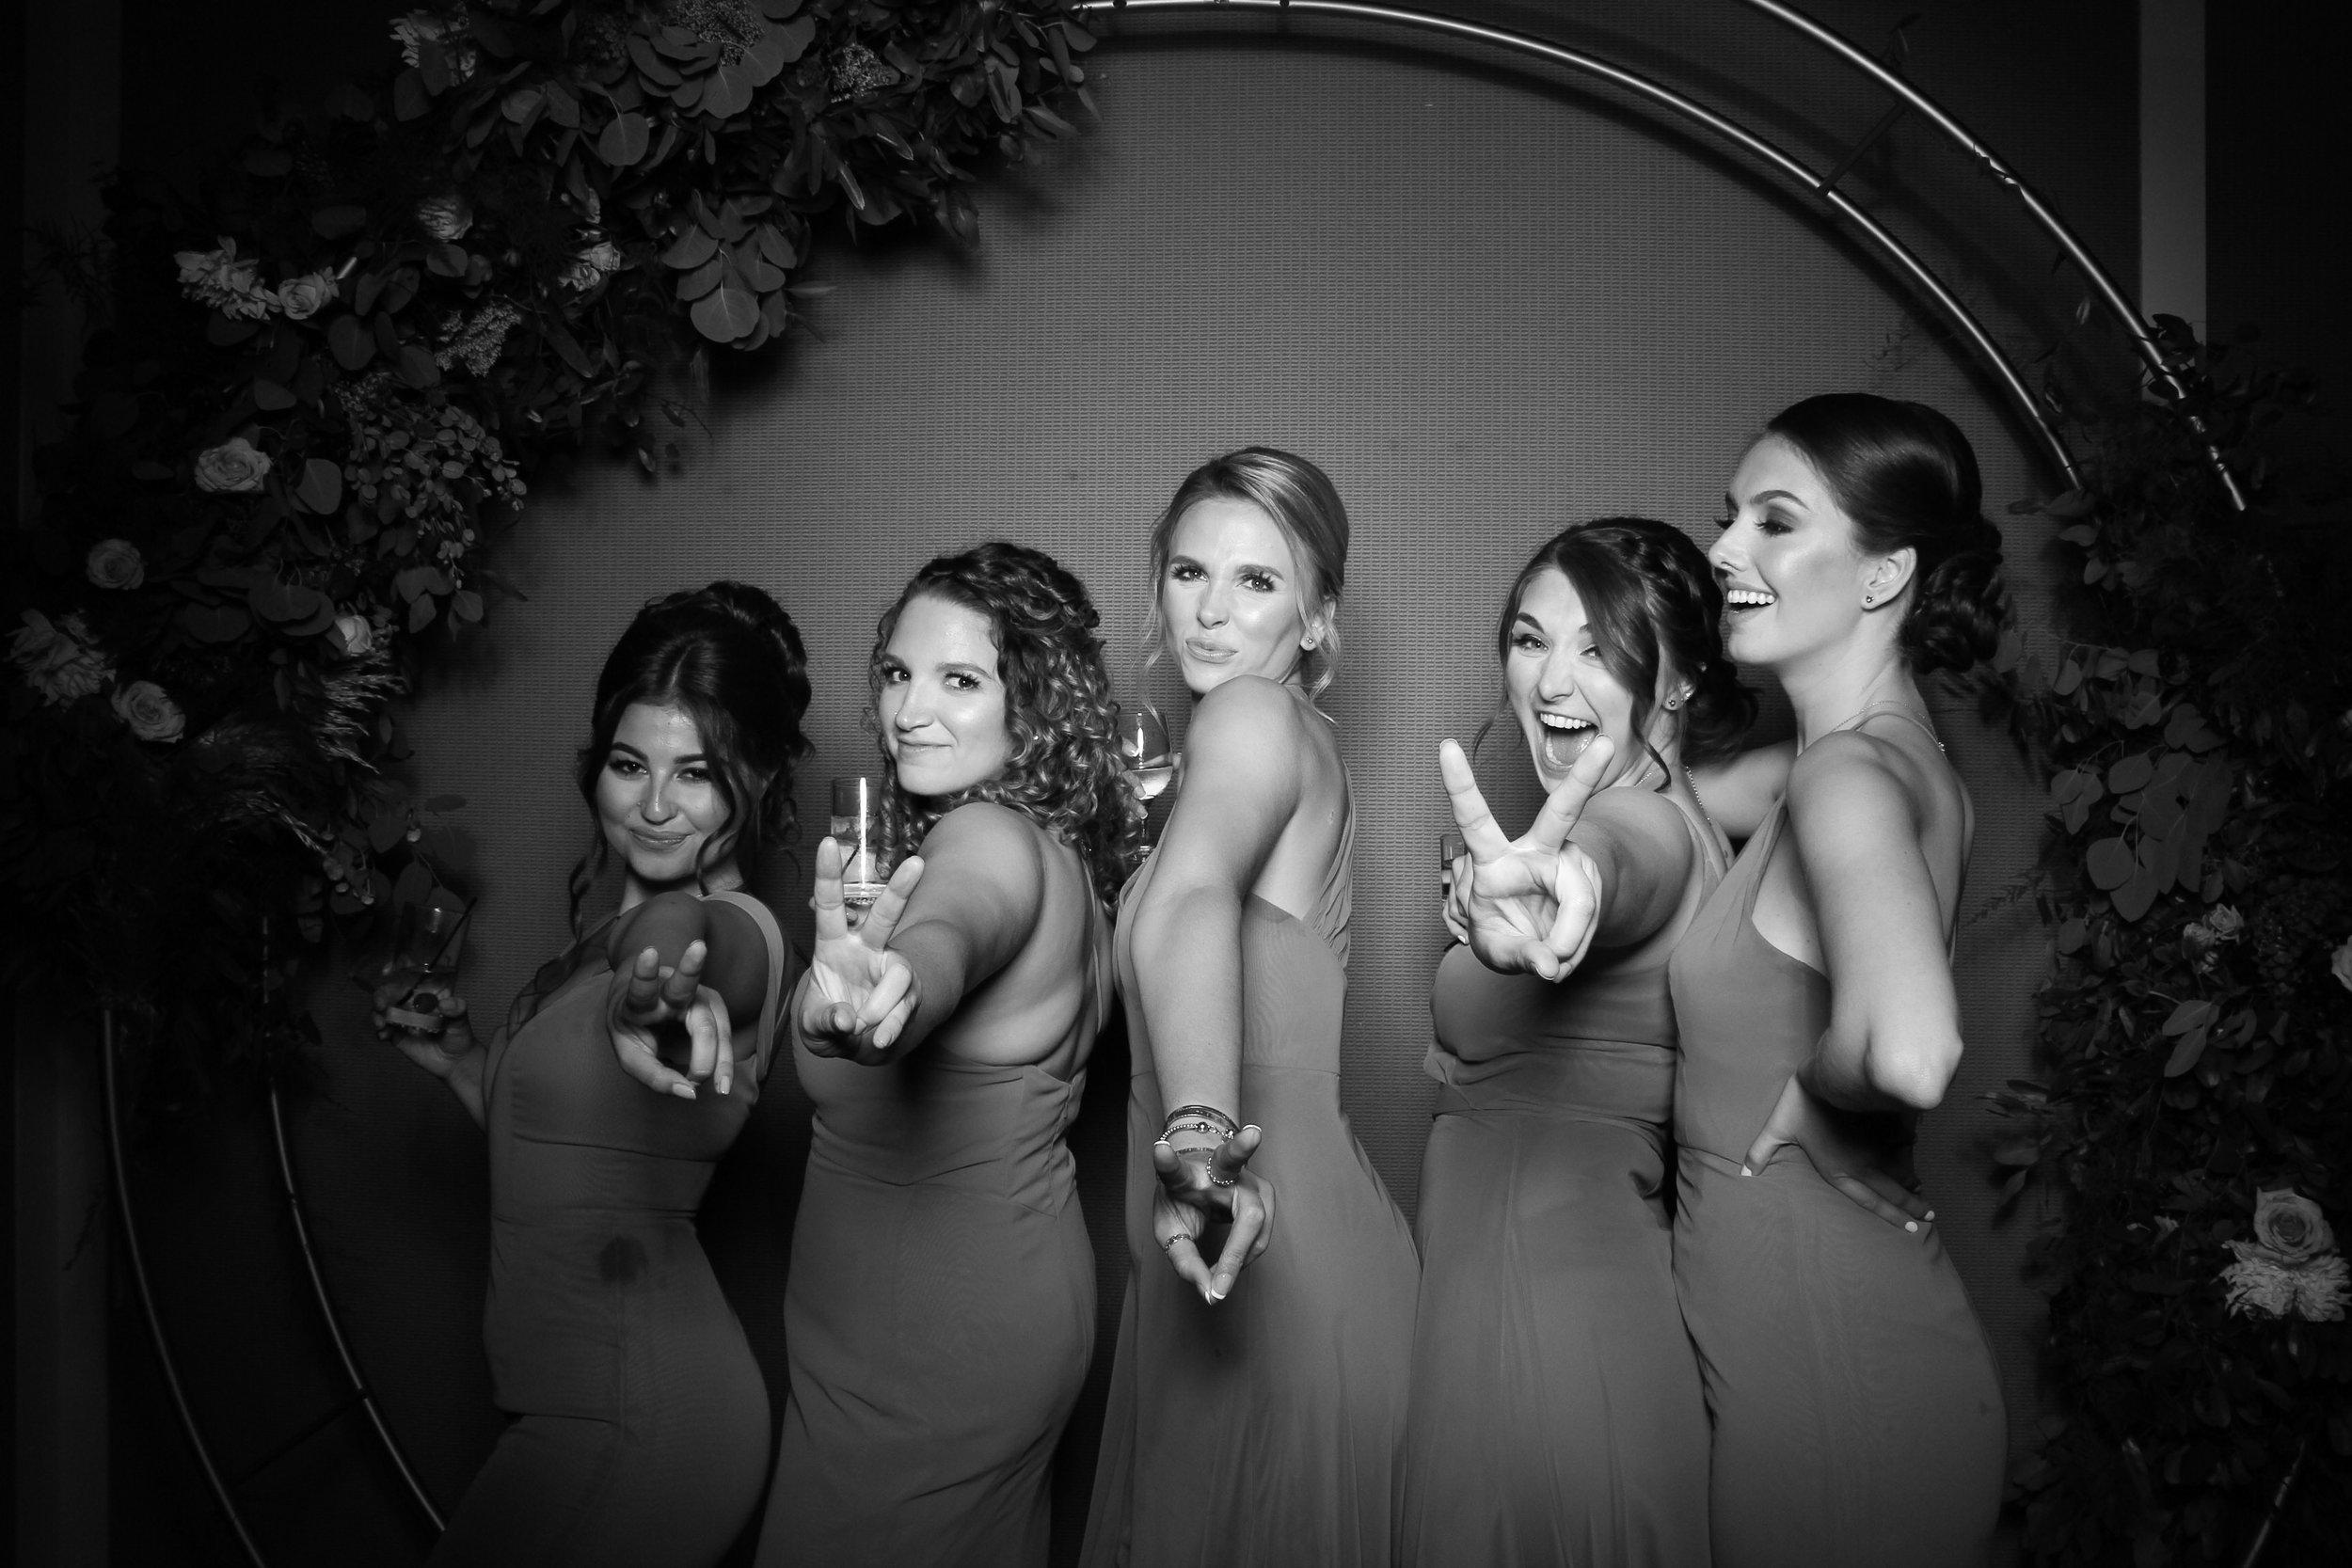 Metropolis_Ballroom_Wedding_Arlington_Heights_Photo_Booth_12.jpg